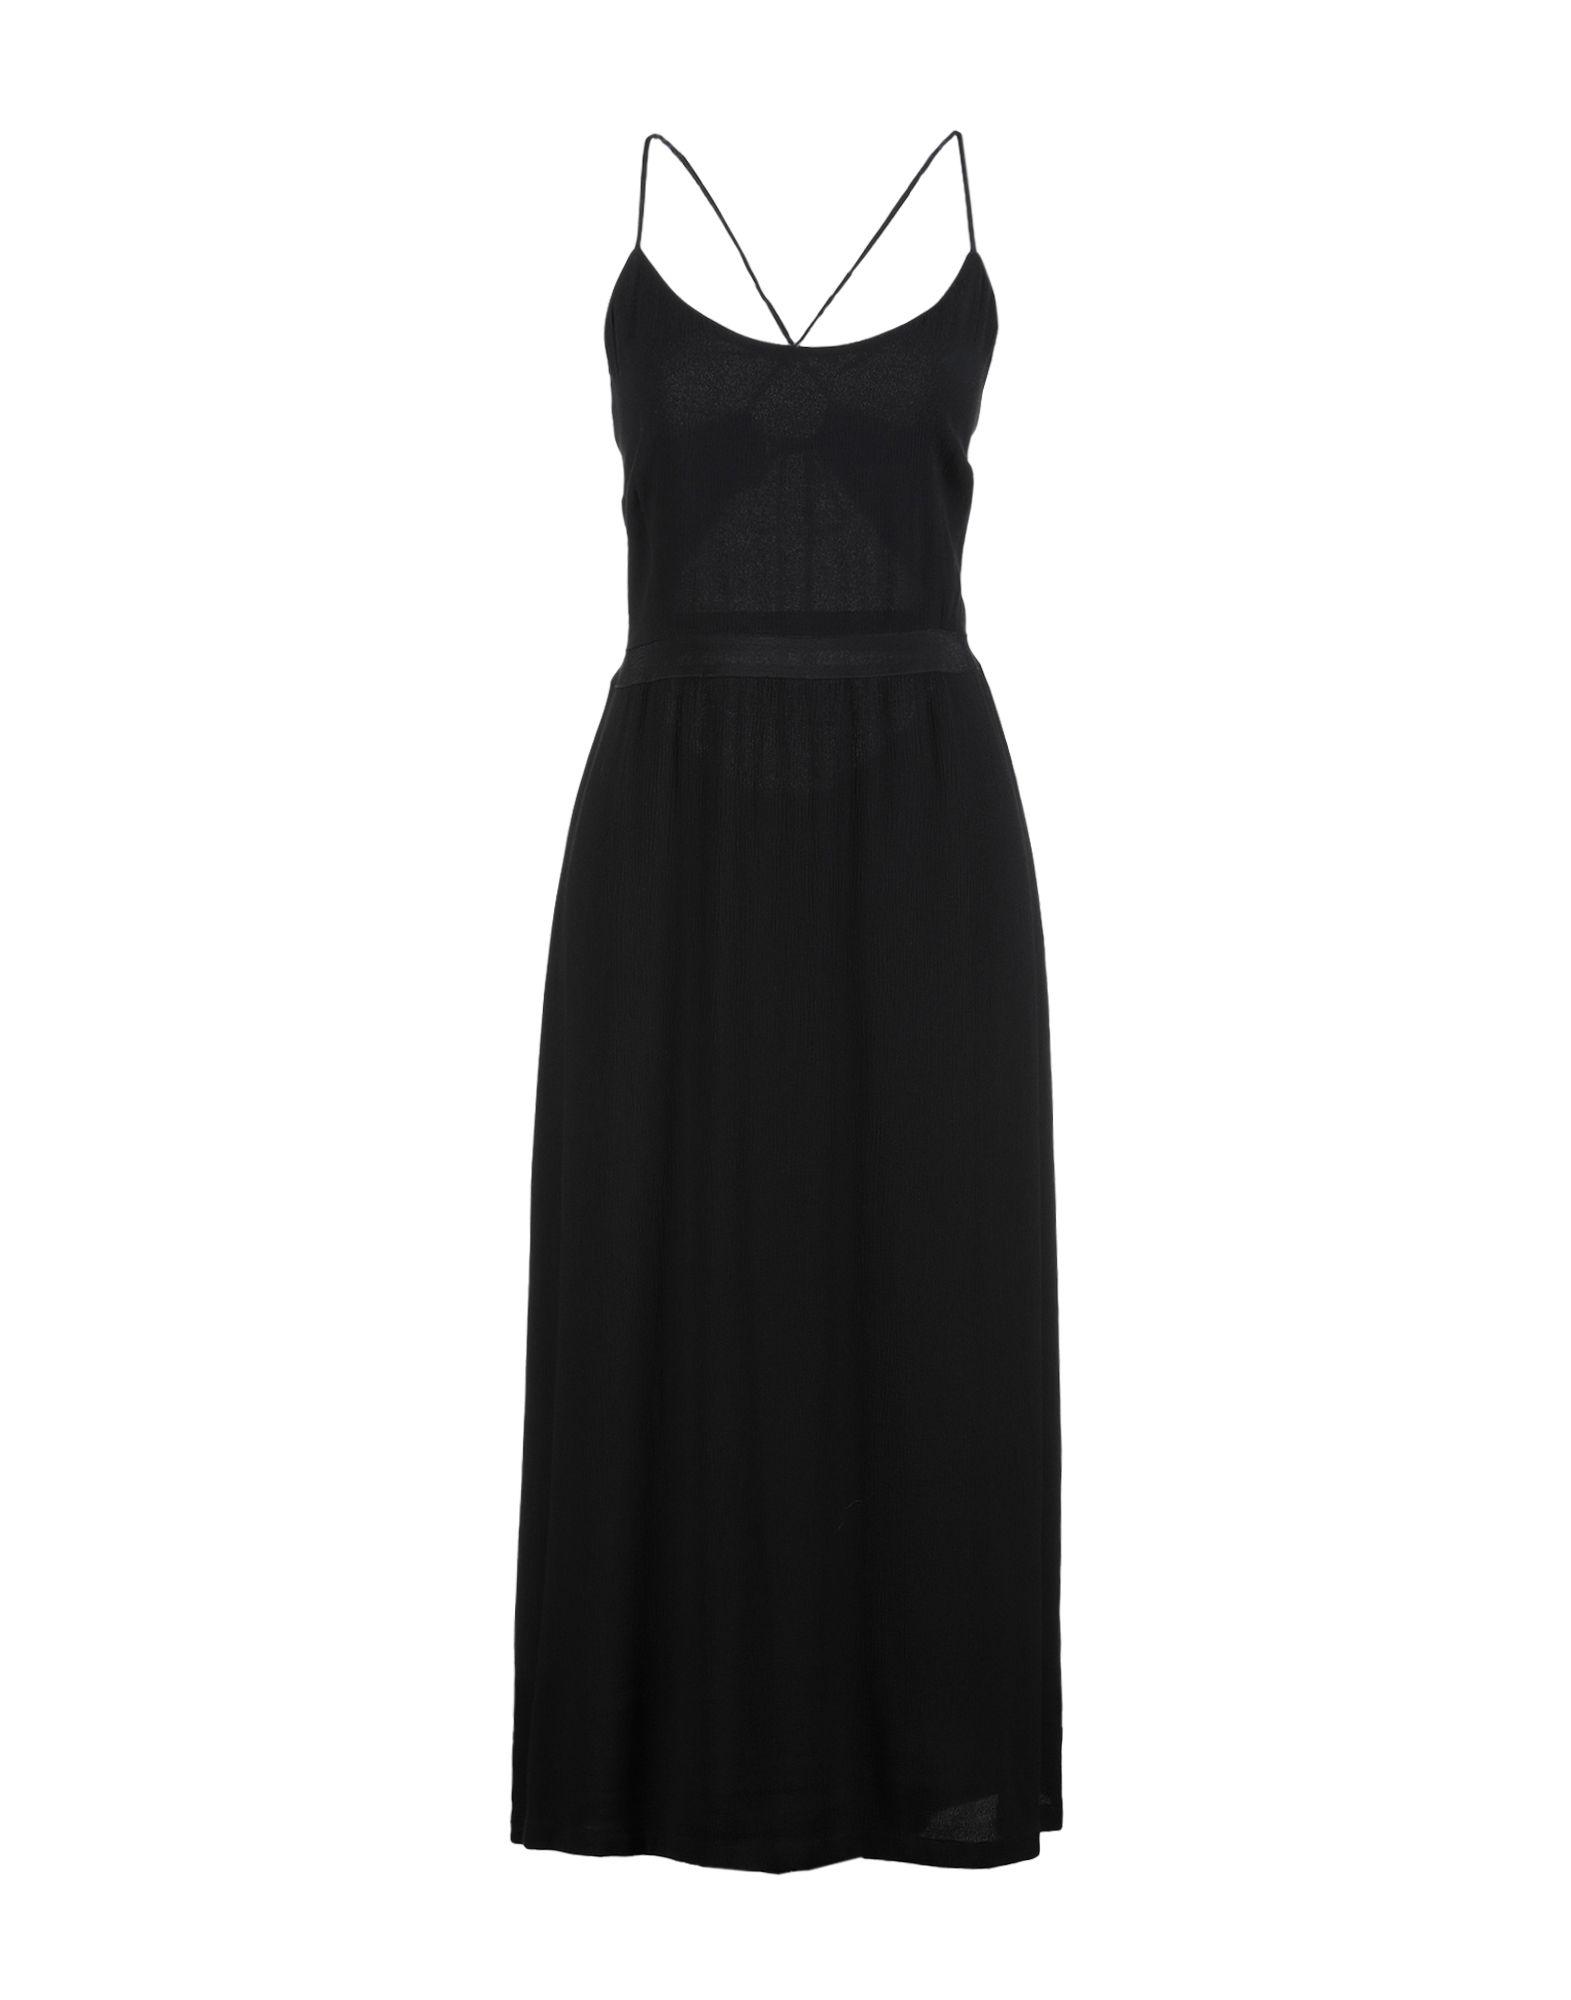 NICE THINGS by PALOMA S. Платье длиной 3/4 цена и фото